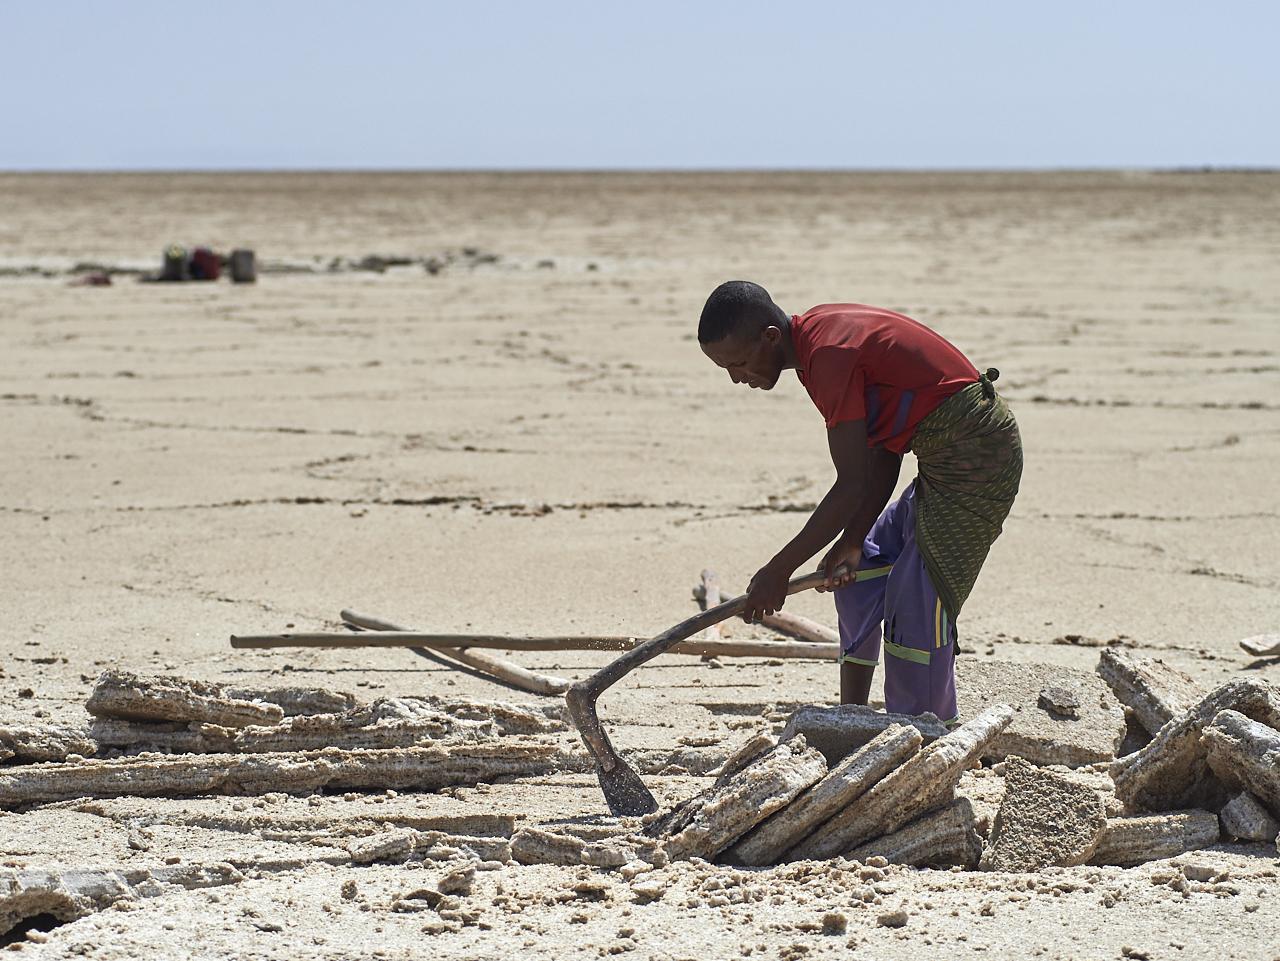 Salt miner, Danakil Depression